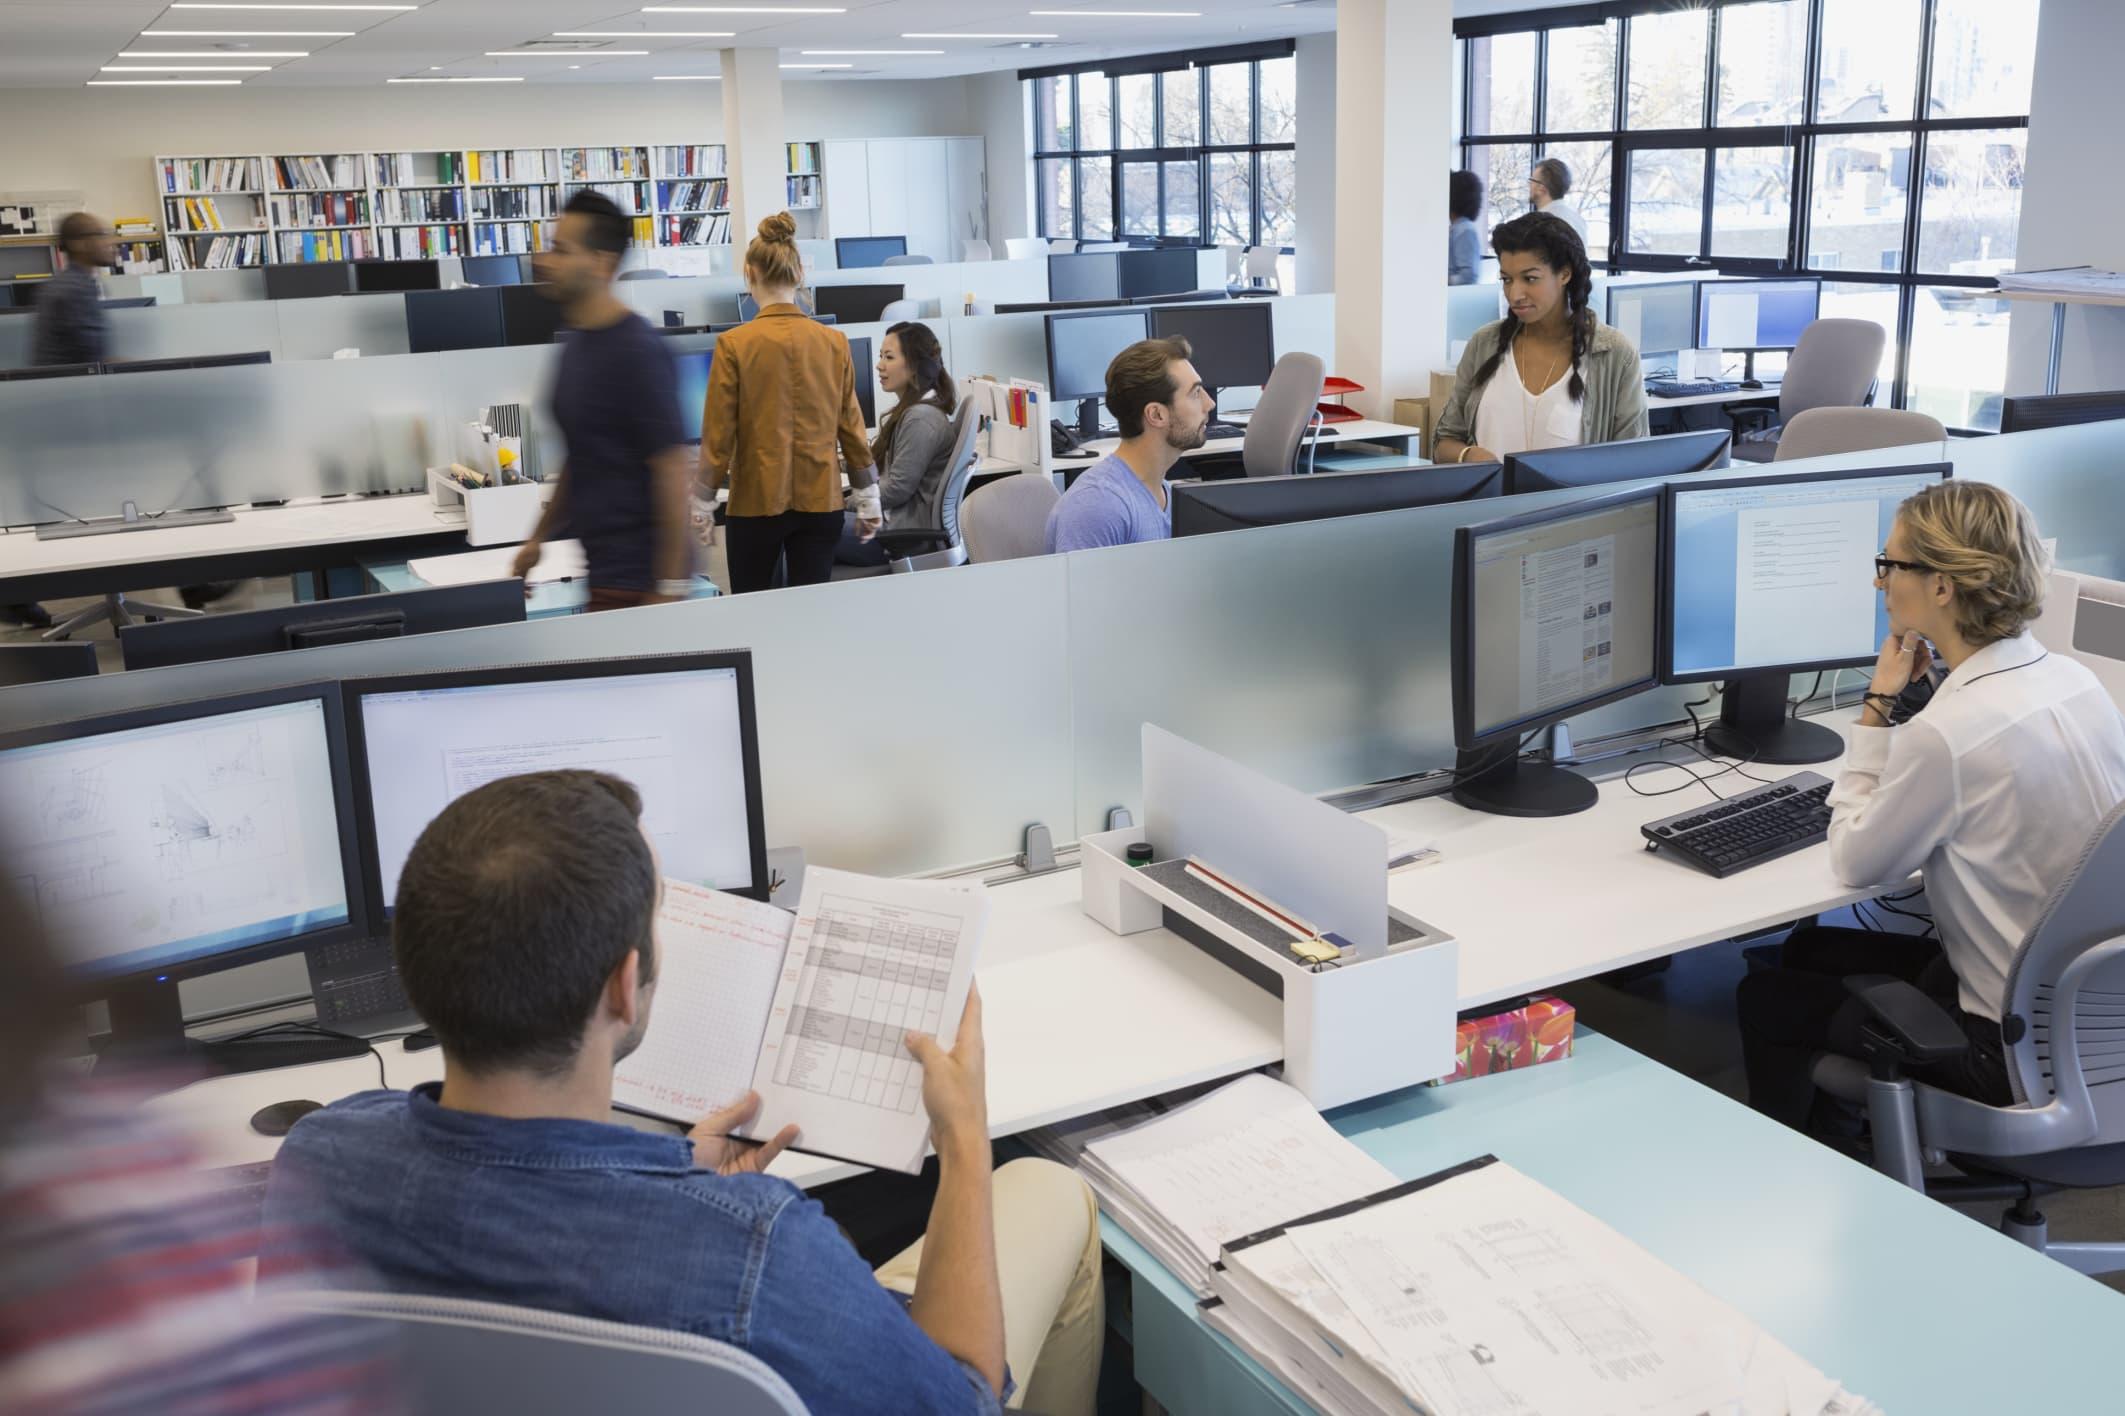 JPMorgan Chase named top US company for diversity